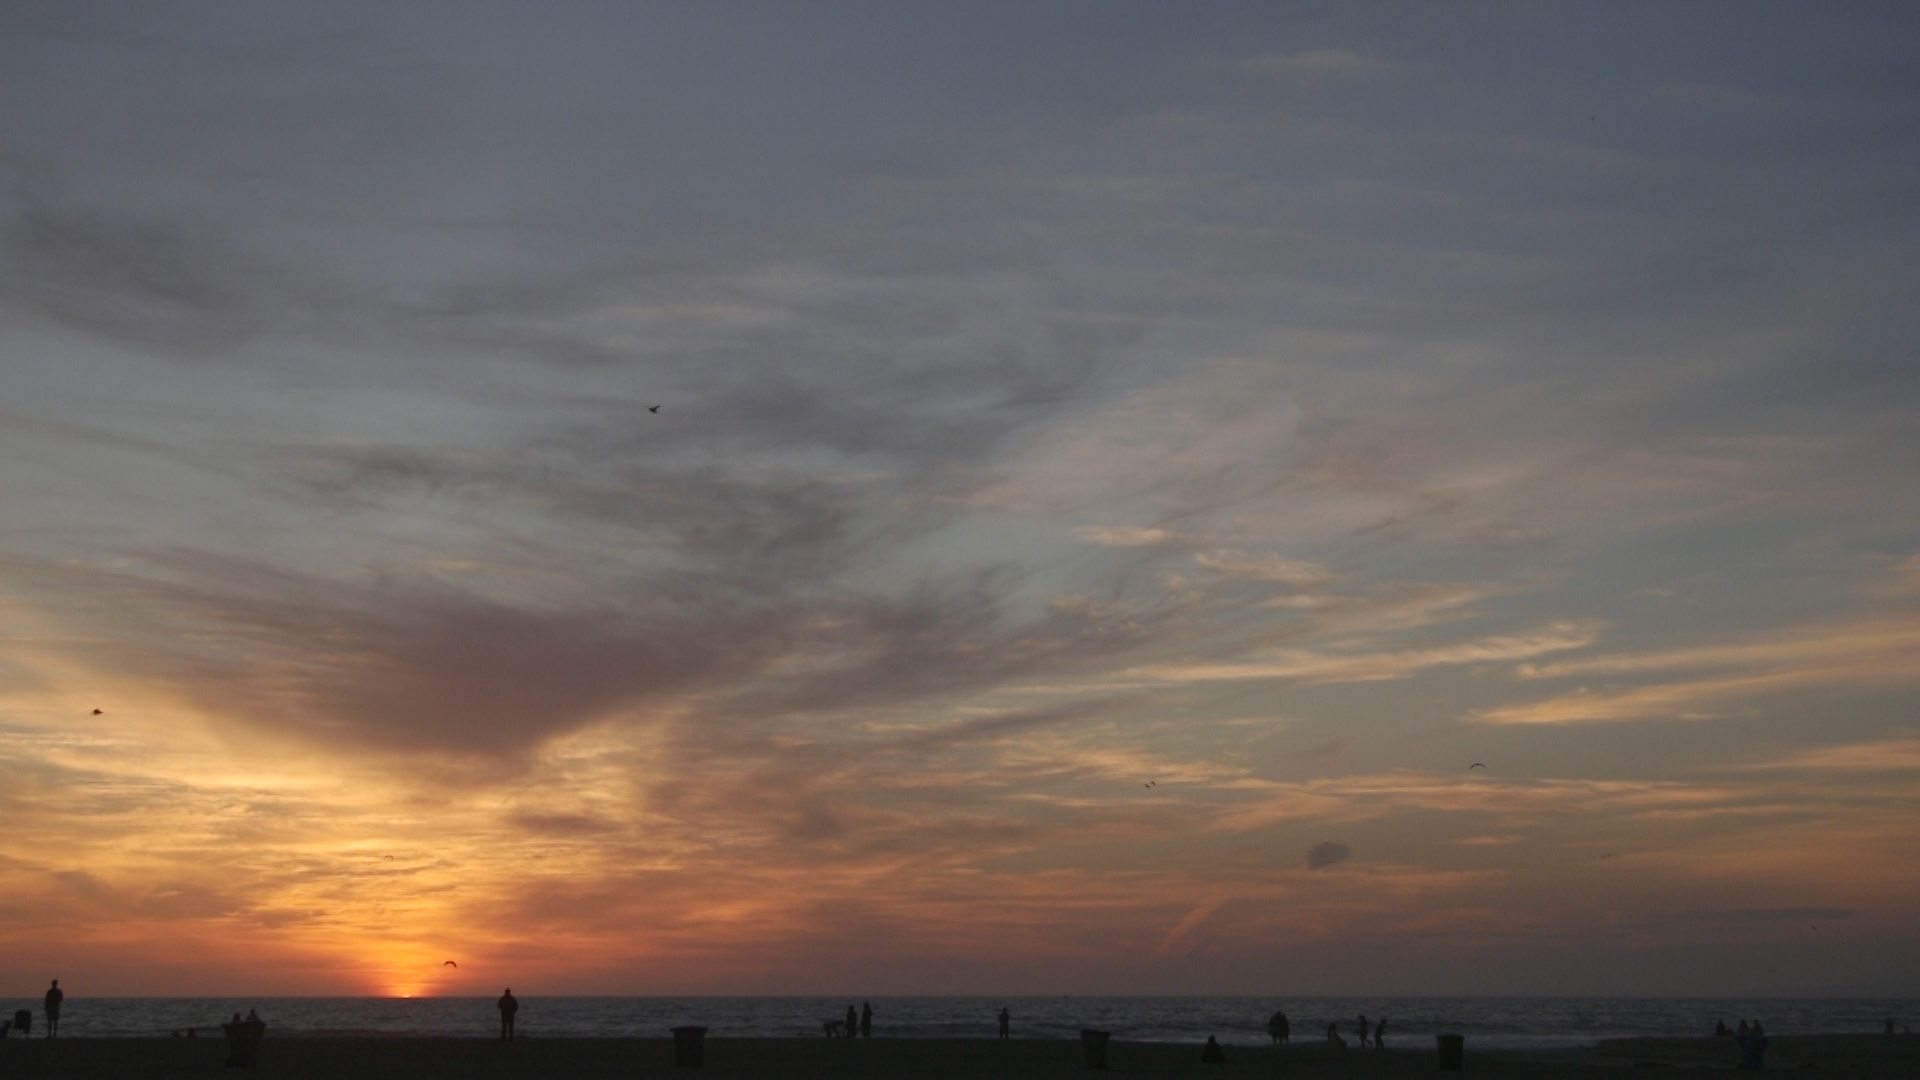 beach-sunset-clouds-orange-sky.jpg